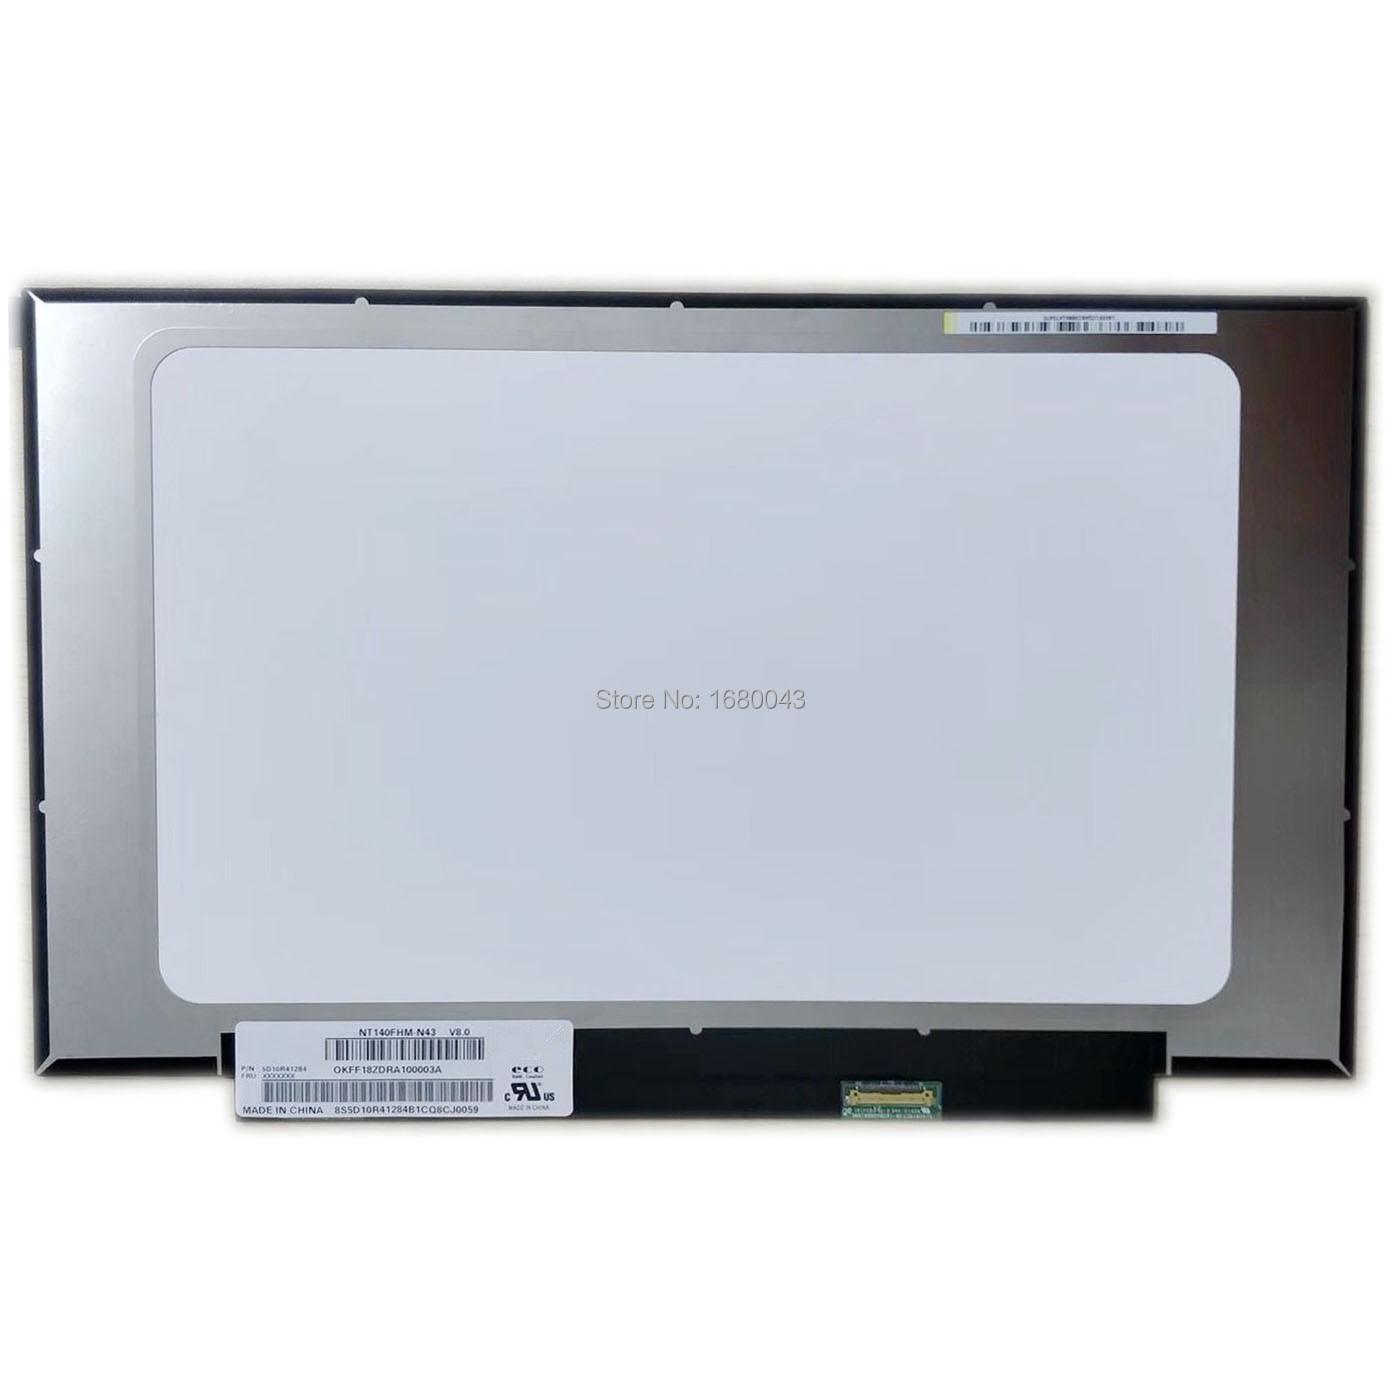 NT140FHM-N43 V8.0 fit B140HAN04.0 N140HCA-EAC NV140FHM-N62 N61 LCD LED Screen 1920*1080 30 PIN NEW IPSNT140FHM-N43 V8.0 fit B140HAN04.0 N140HCA-EAC NV140FHM-N62 N61 LCD LED Screen 1920*1080 30 PIN NEW IPS